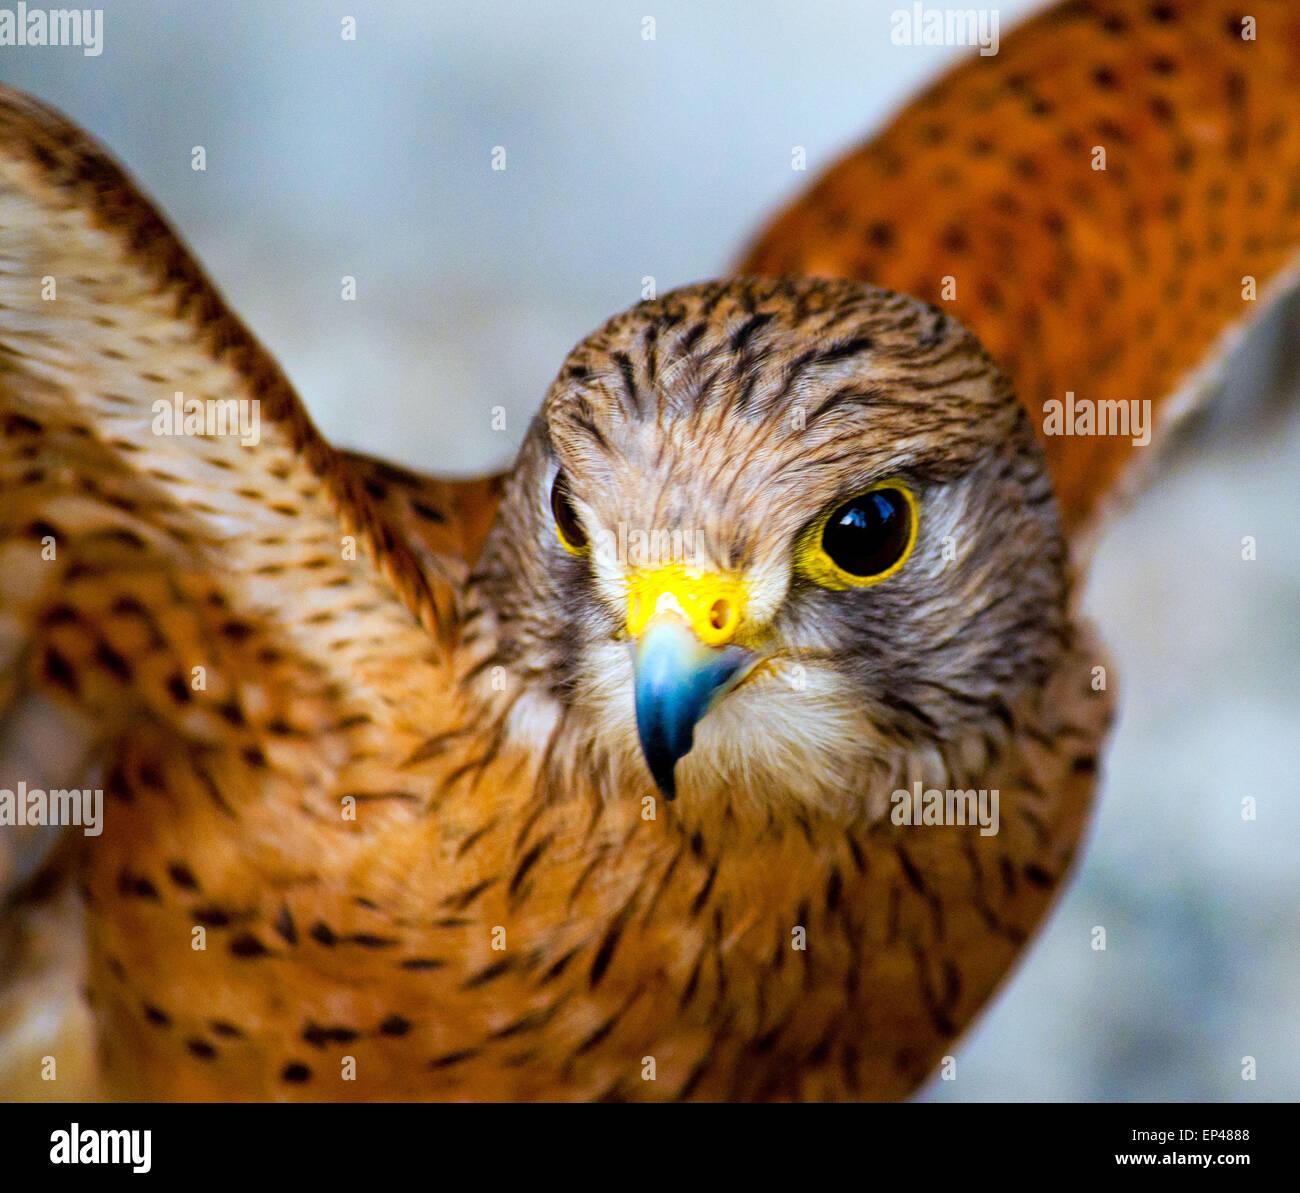 Rock Kestrel spreading it's wings, South Africa - Stock Image